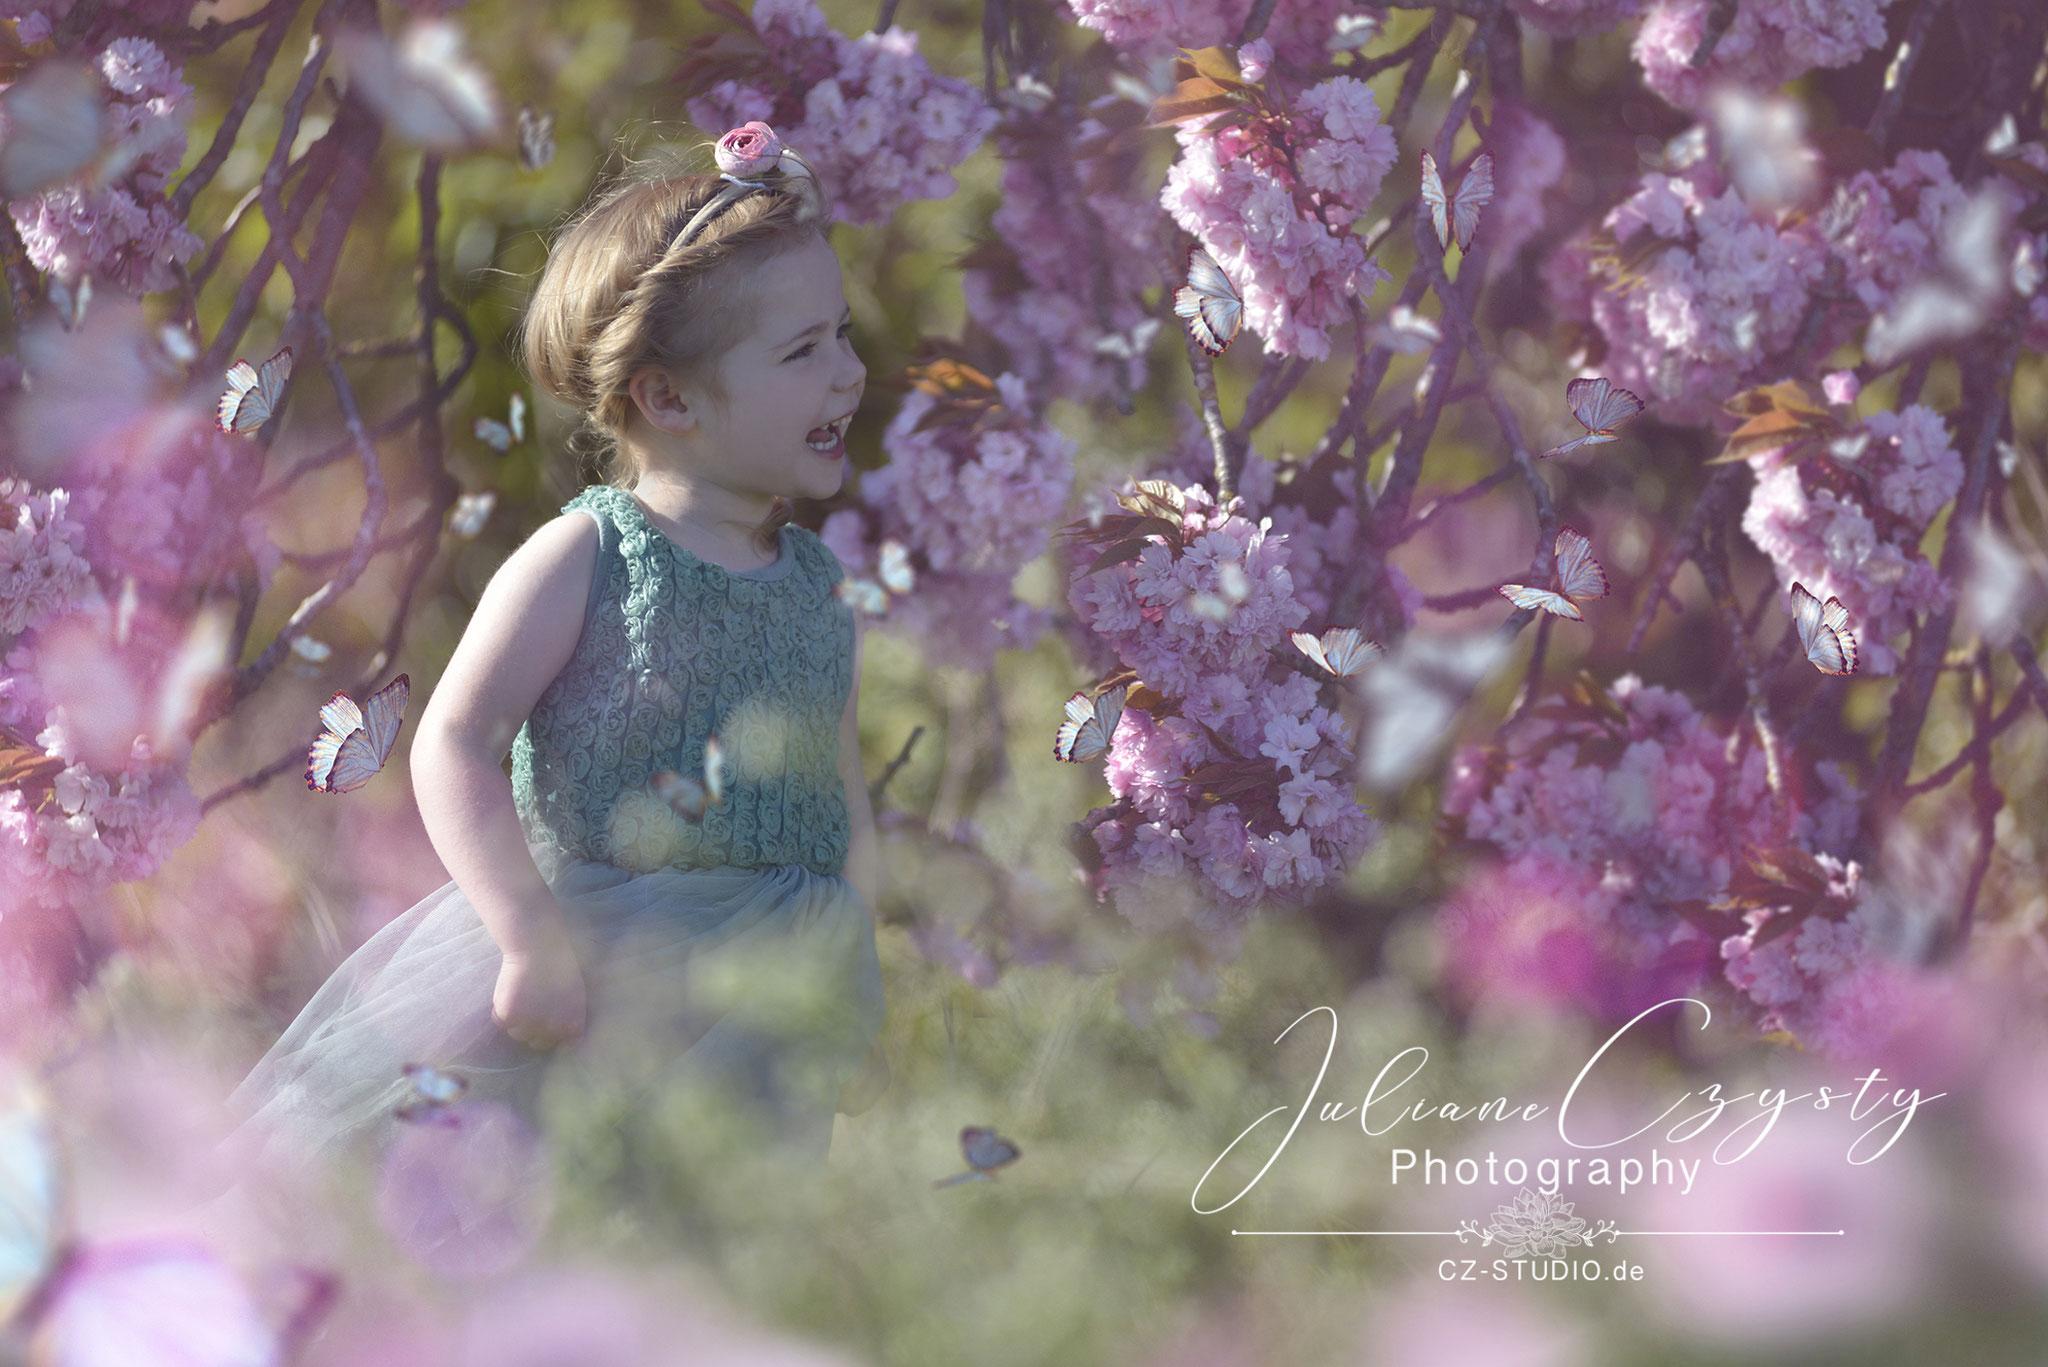 Wunderschöne Portraits - Juliane Czysty Fotostudio in ROW